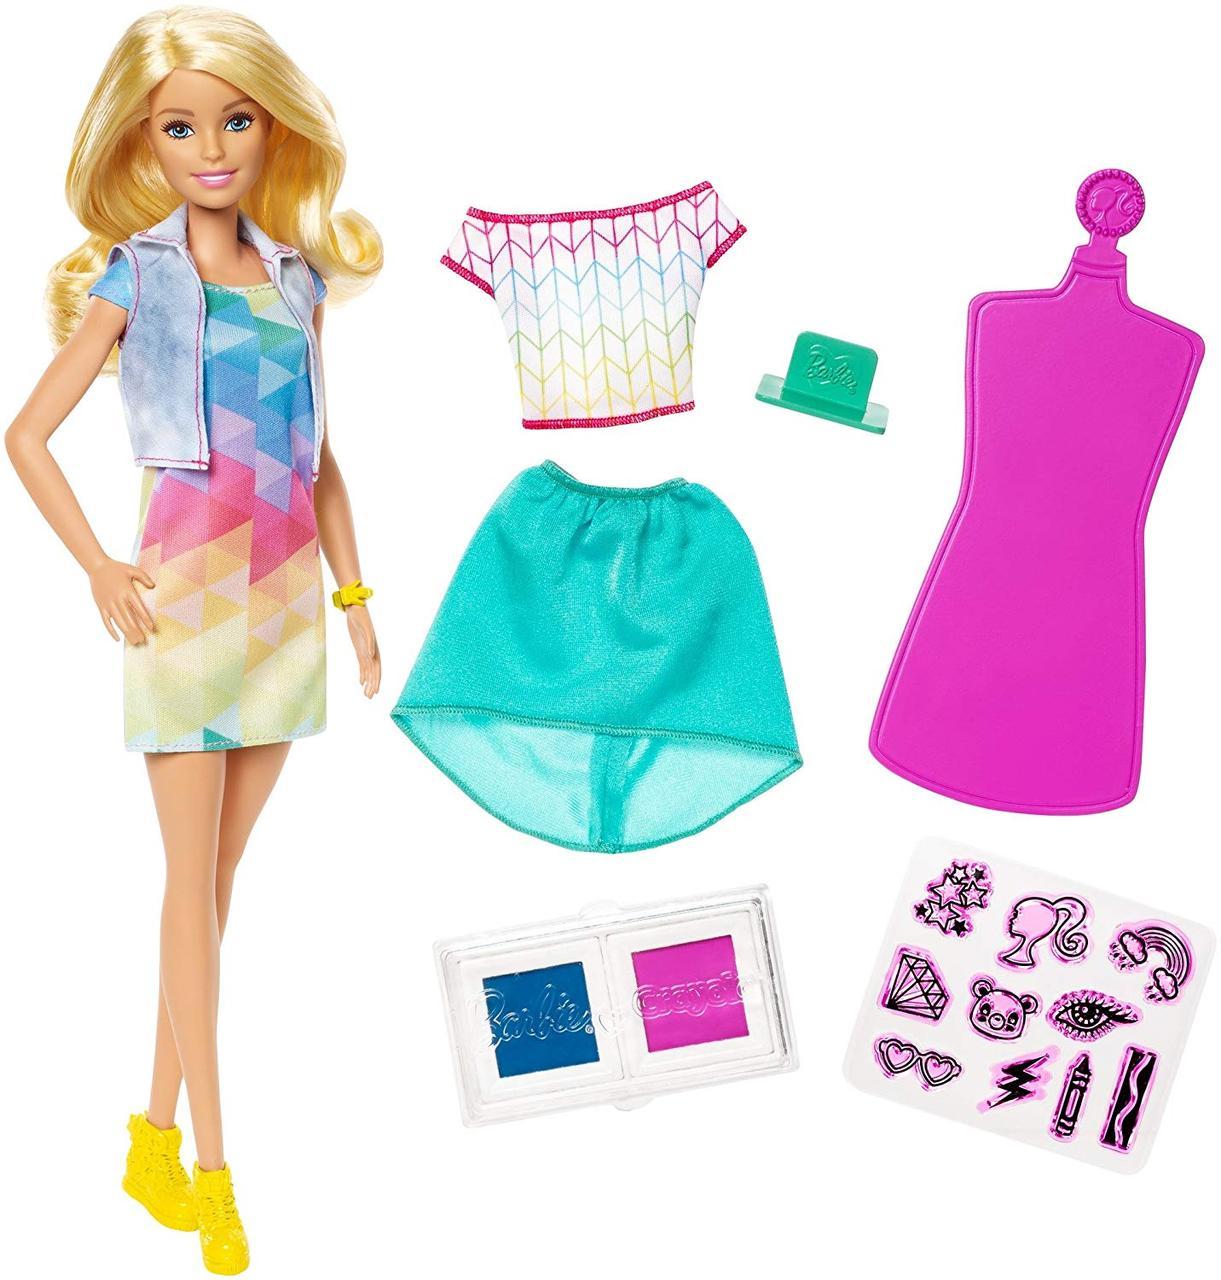 Кукла Барби дизайнер Цветной штамп